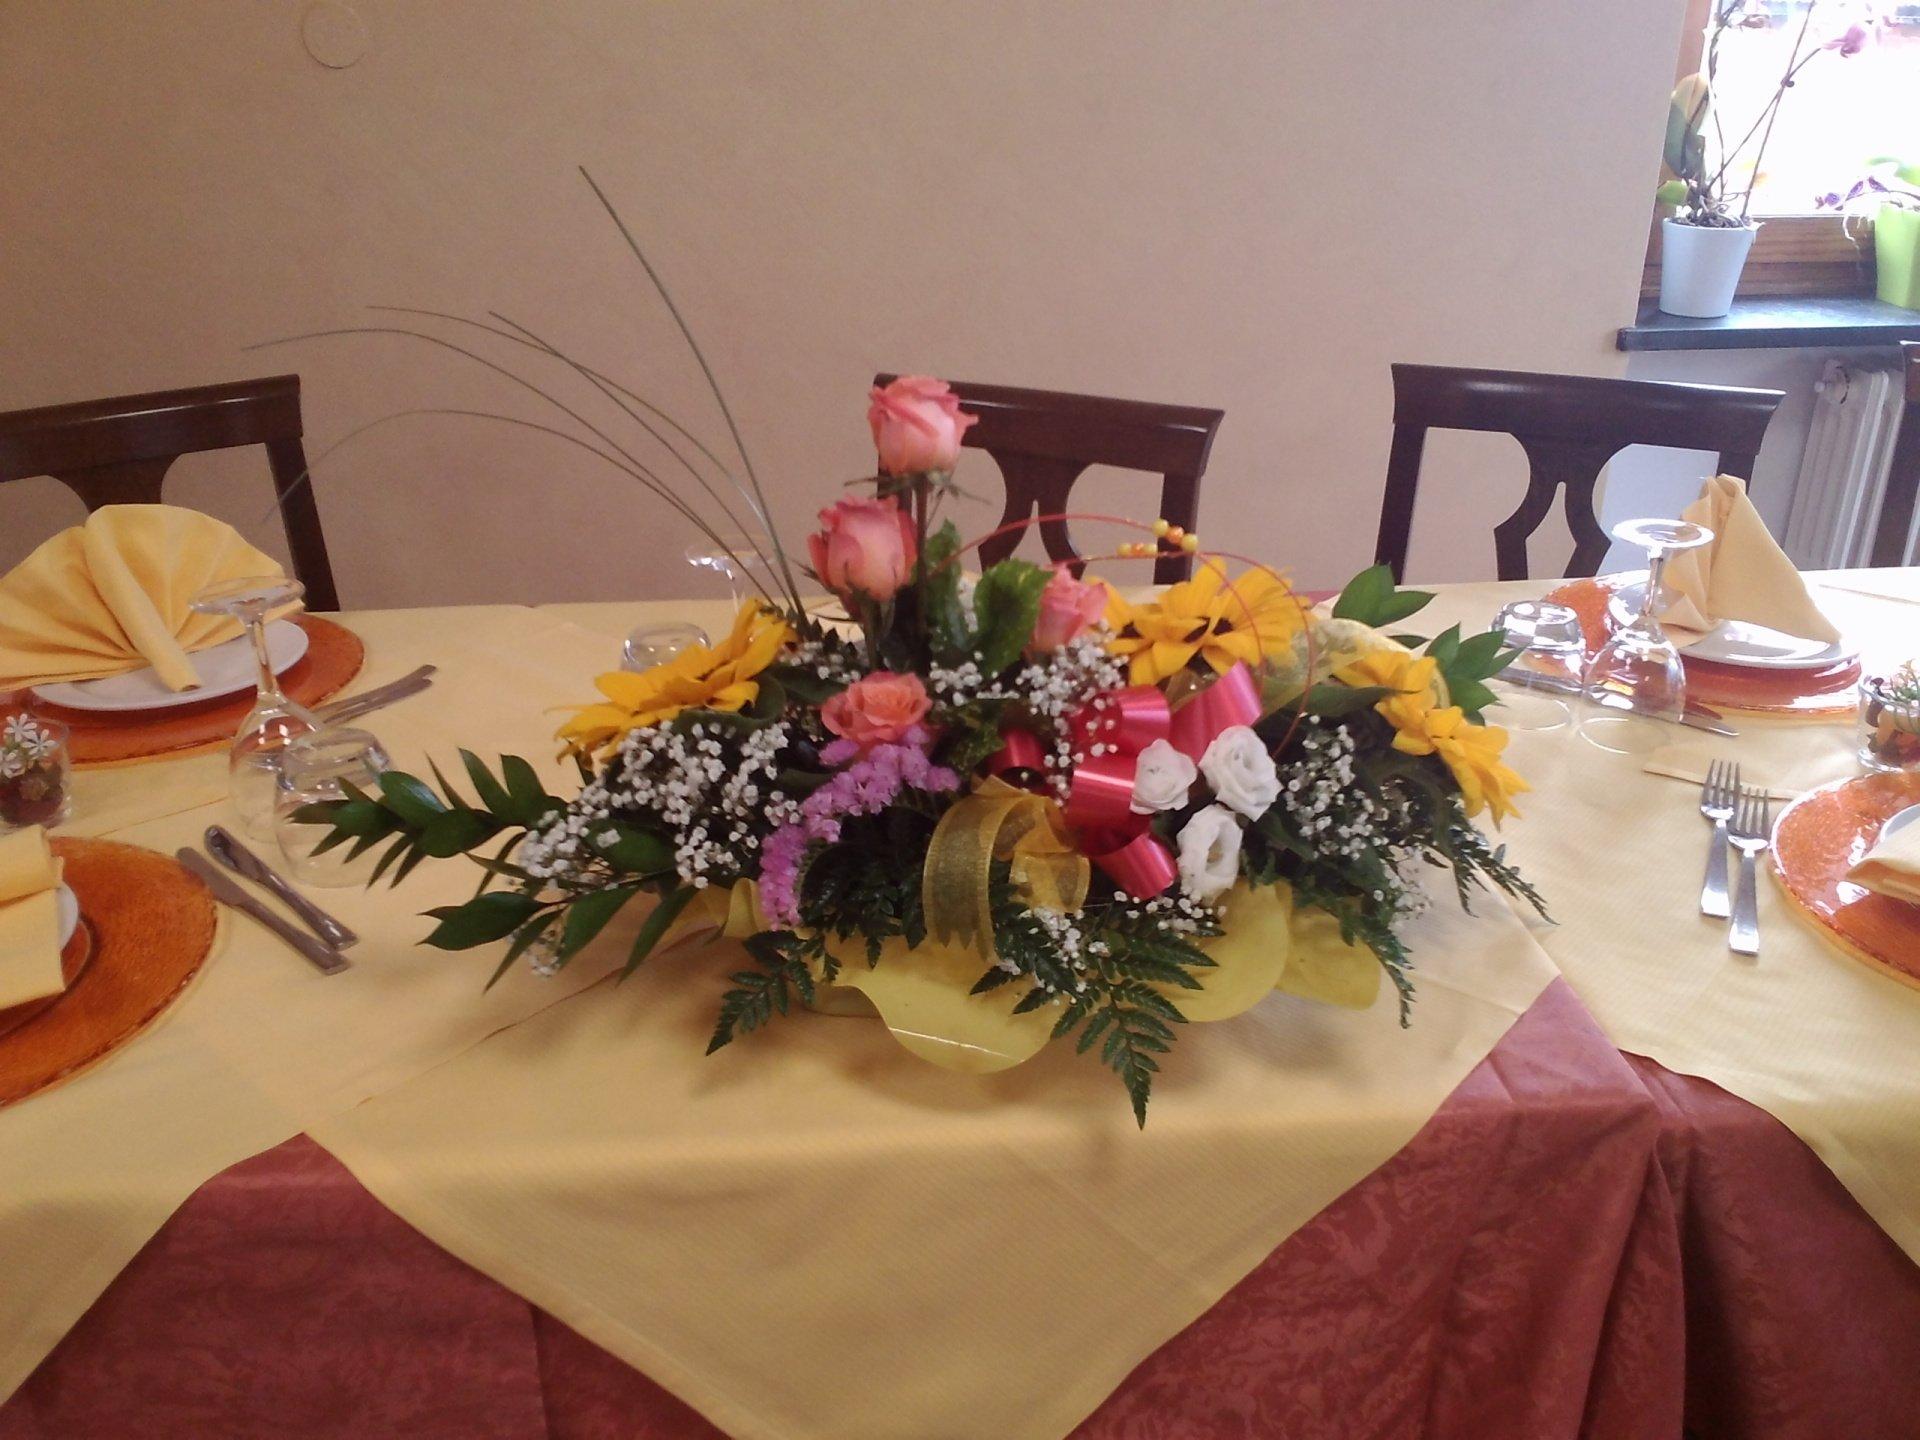 Cucina tipica piemontese bruzolo val di susa antica trattoria la stellina - Cucina tipica piemontese ...